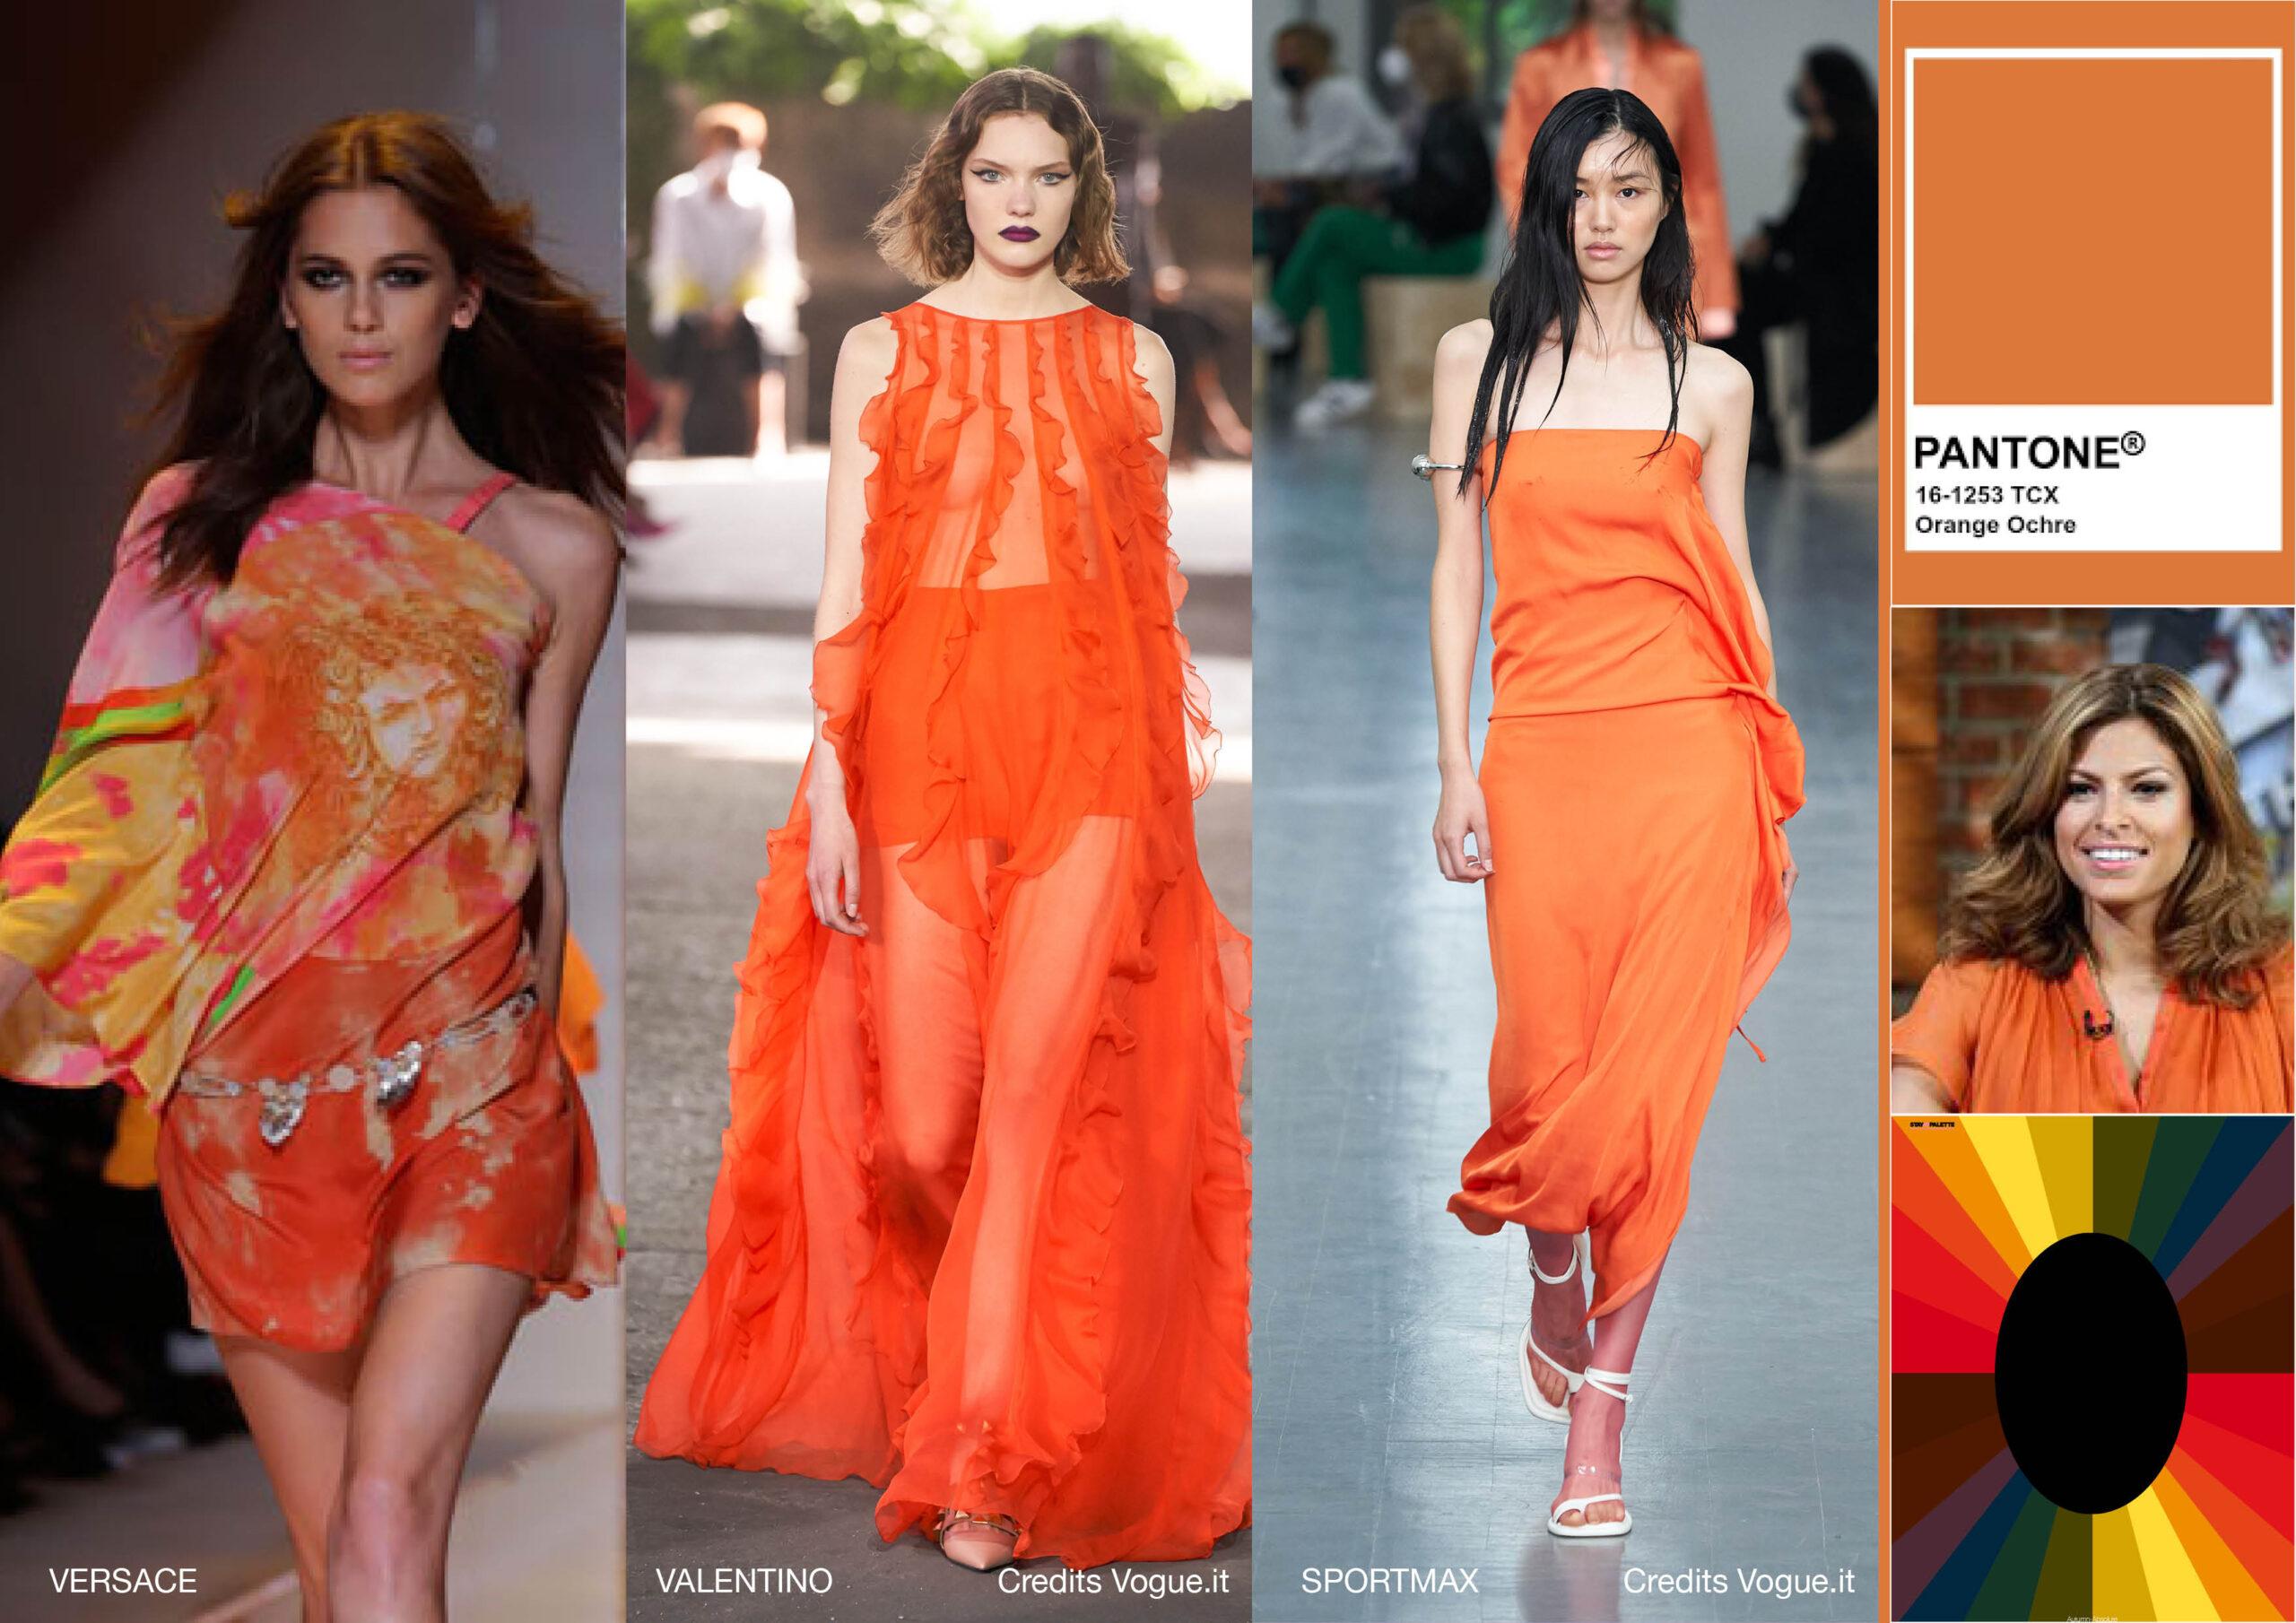 Orange Ochre Primavera estate 2021